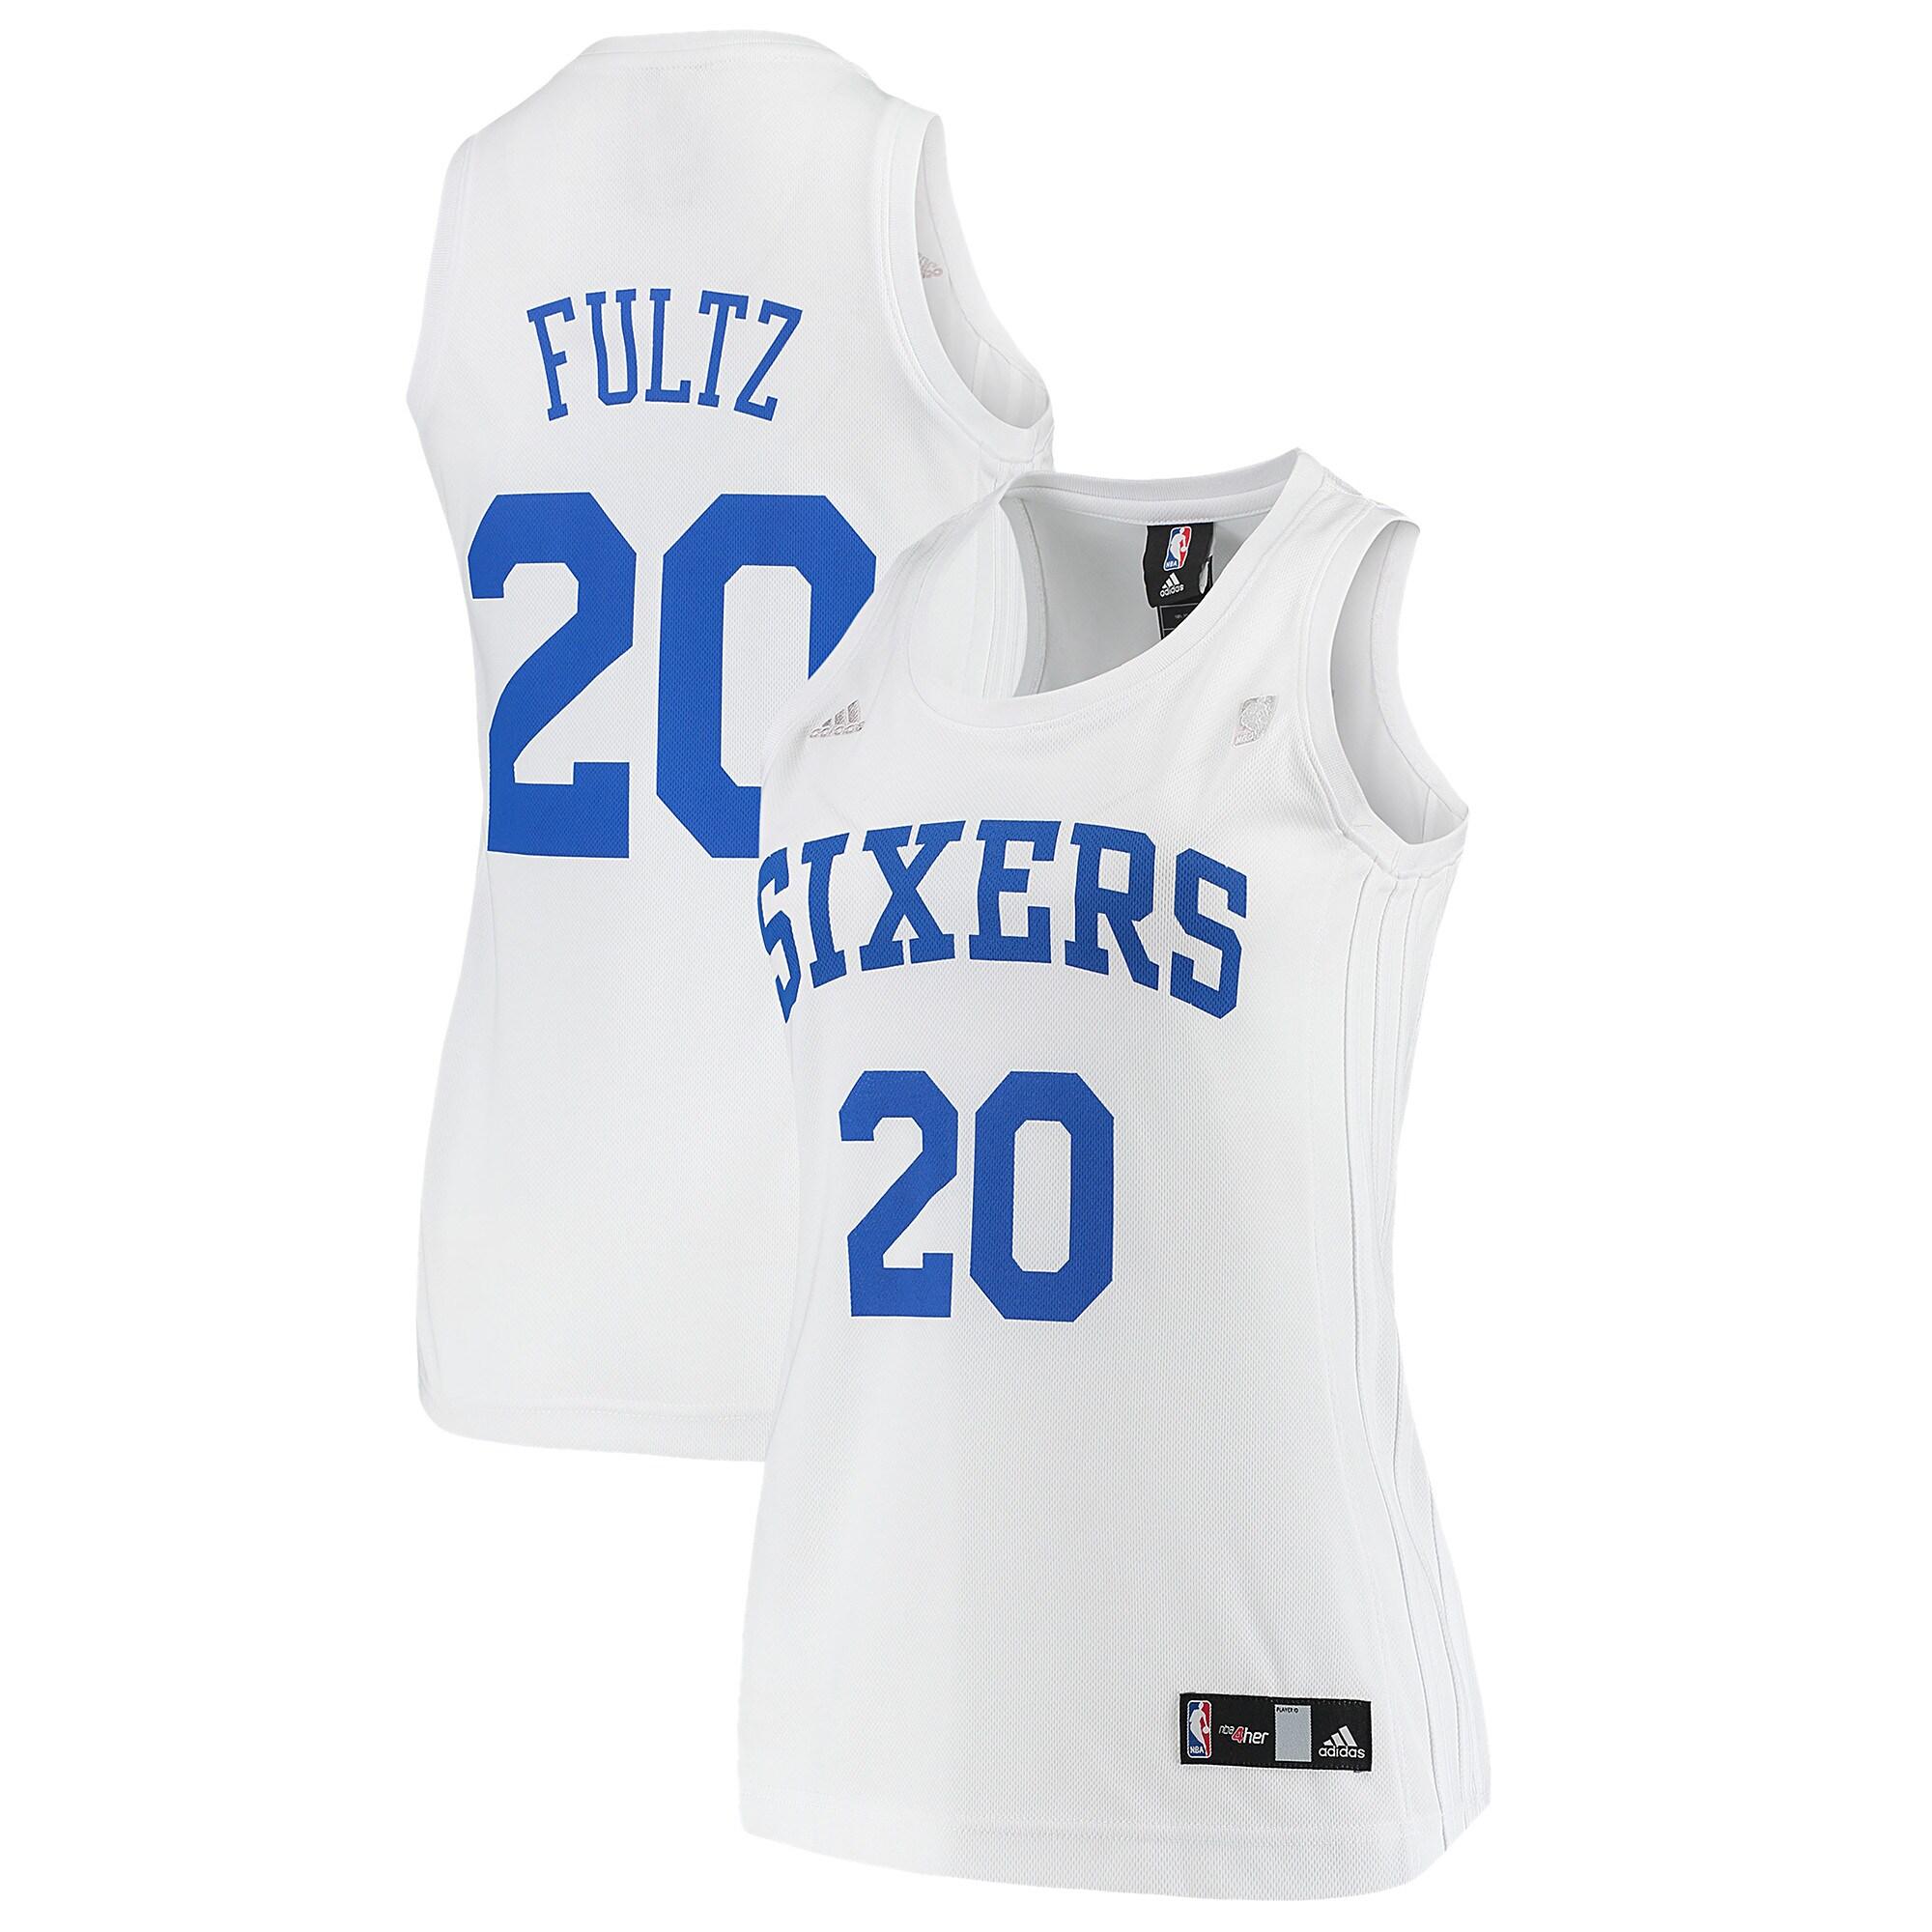 Markelle Fultz Philadelphia 76ers adidas Women's Home Replica Jersey - White